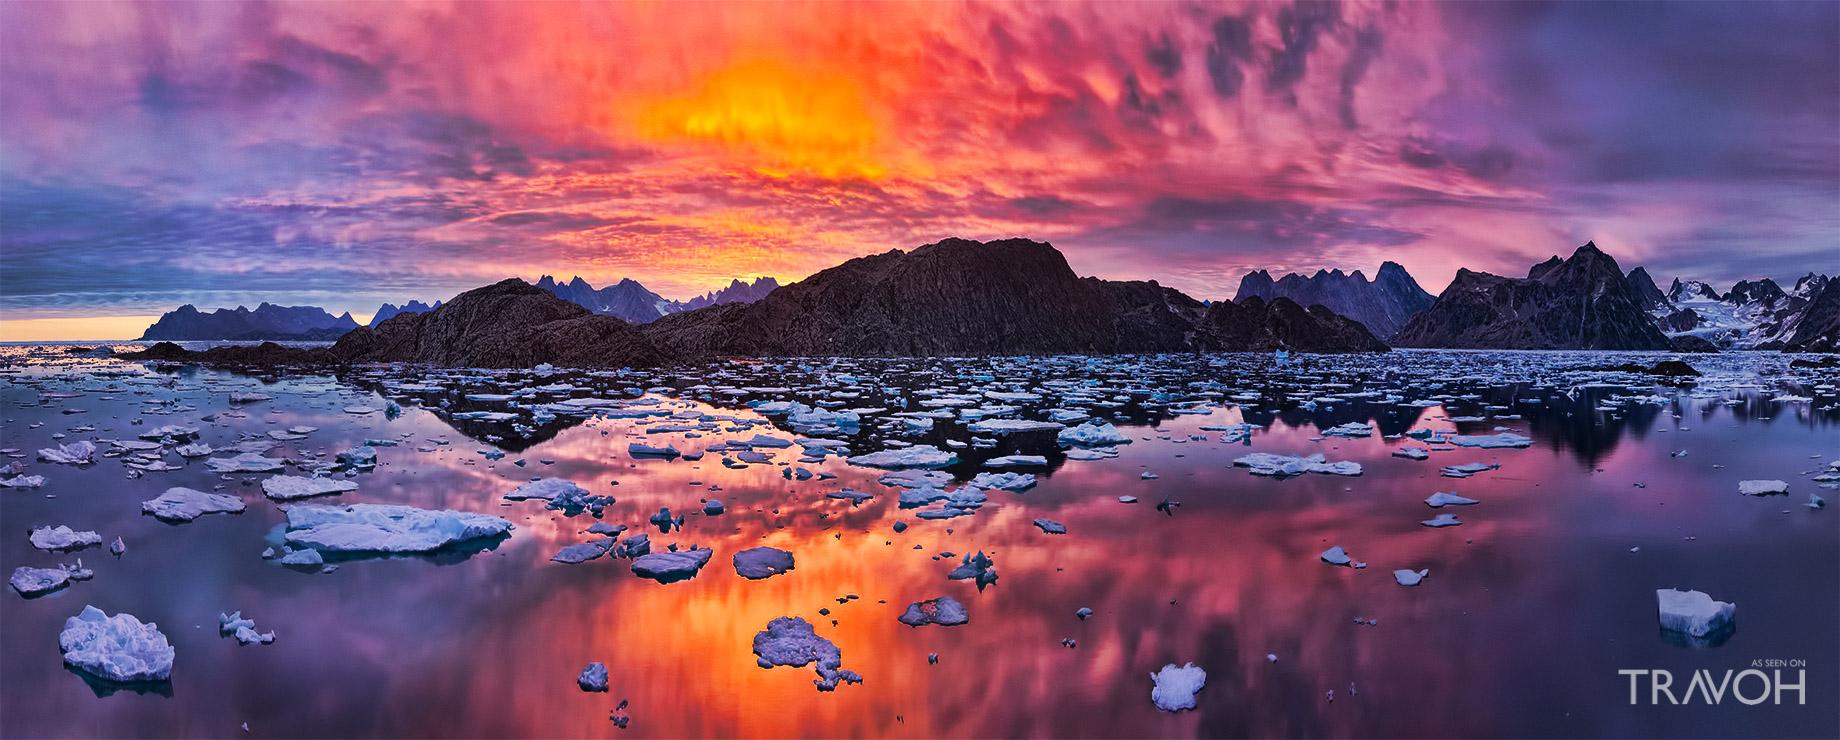 Arctic Icy Sunset - Angmagssalik Island - Torsuut Tunoq Sound - Kulusuk, Sermersooq, Greenland